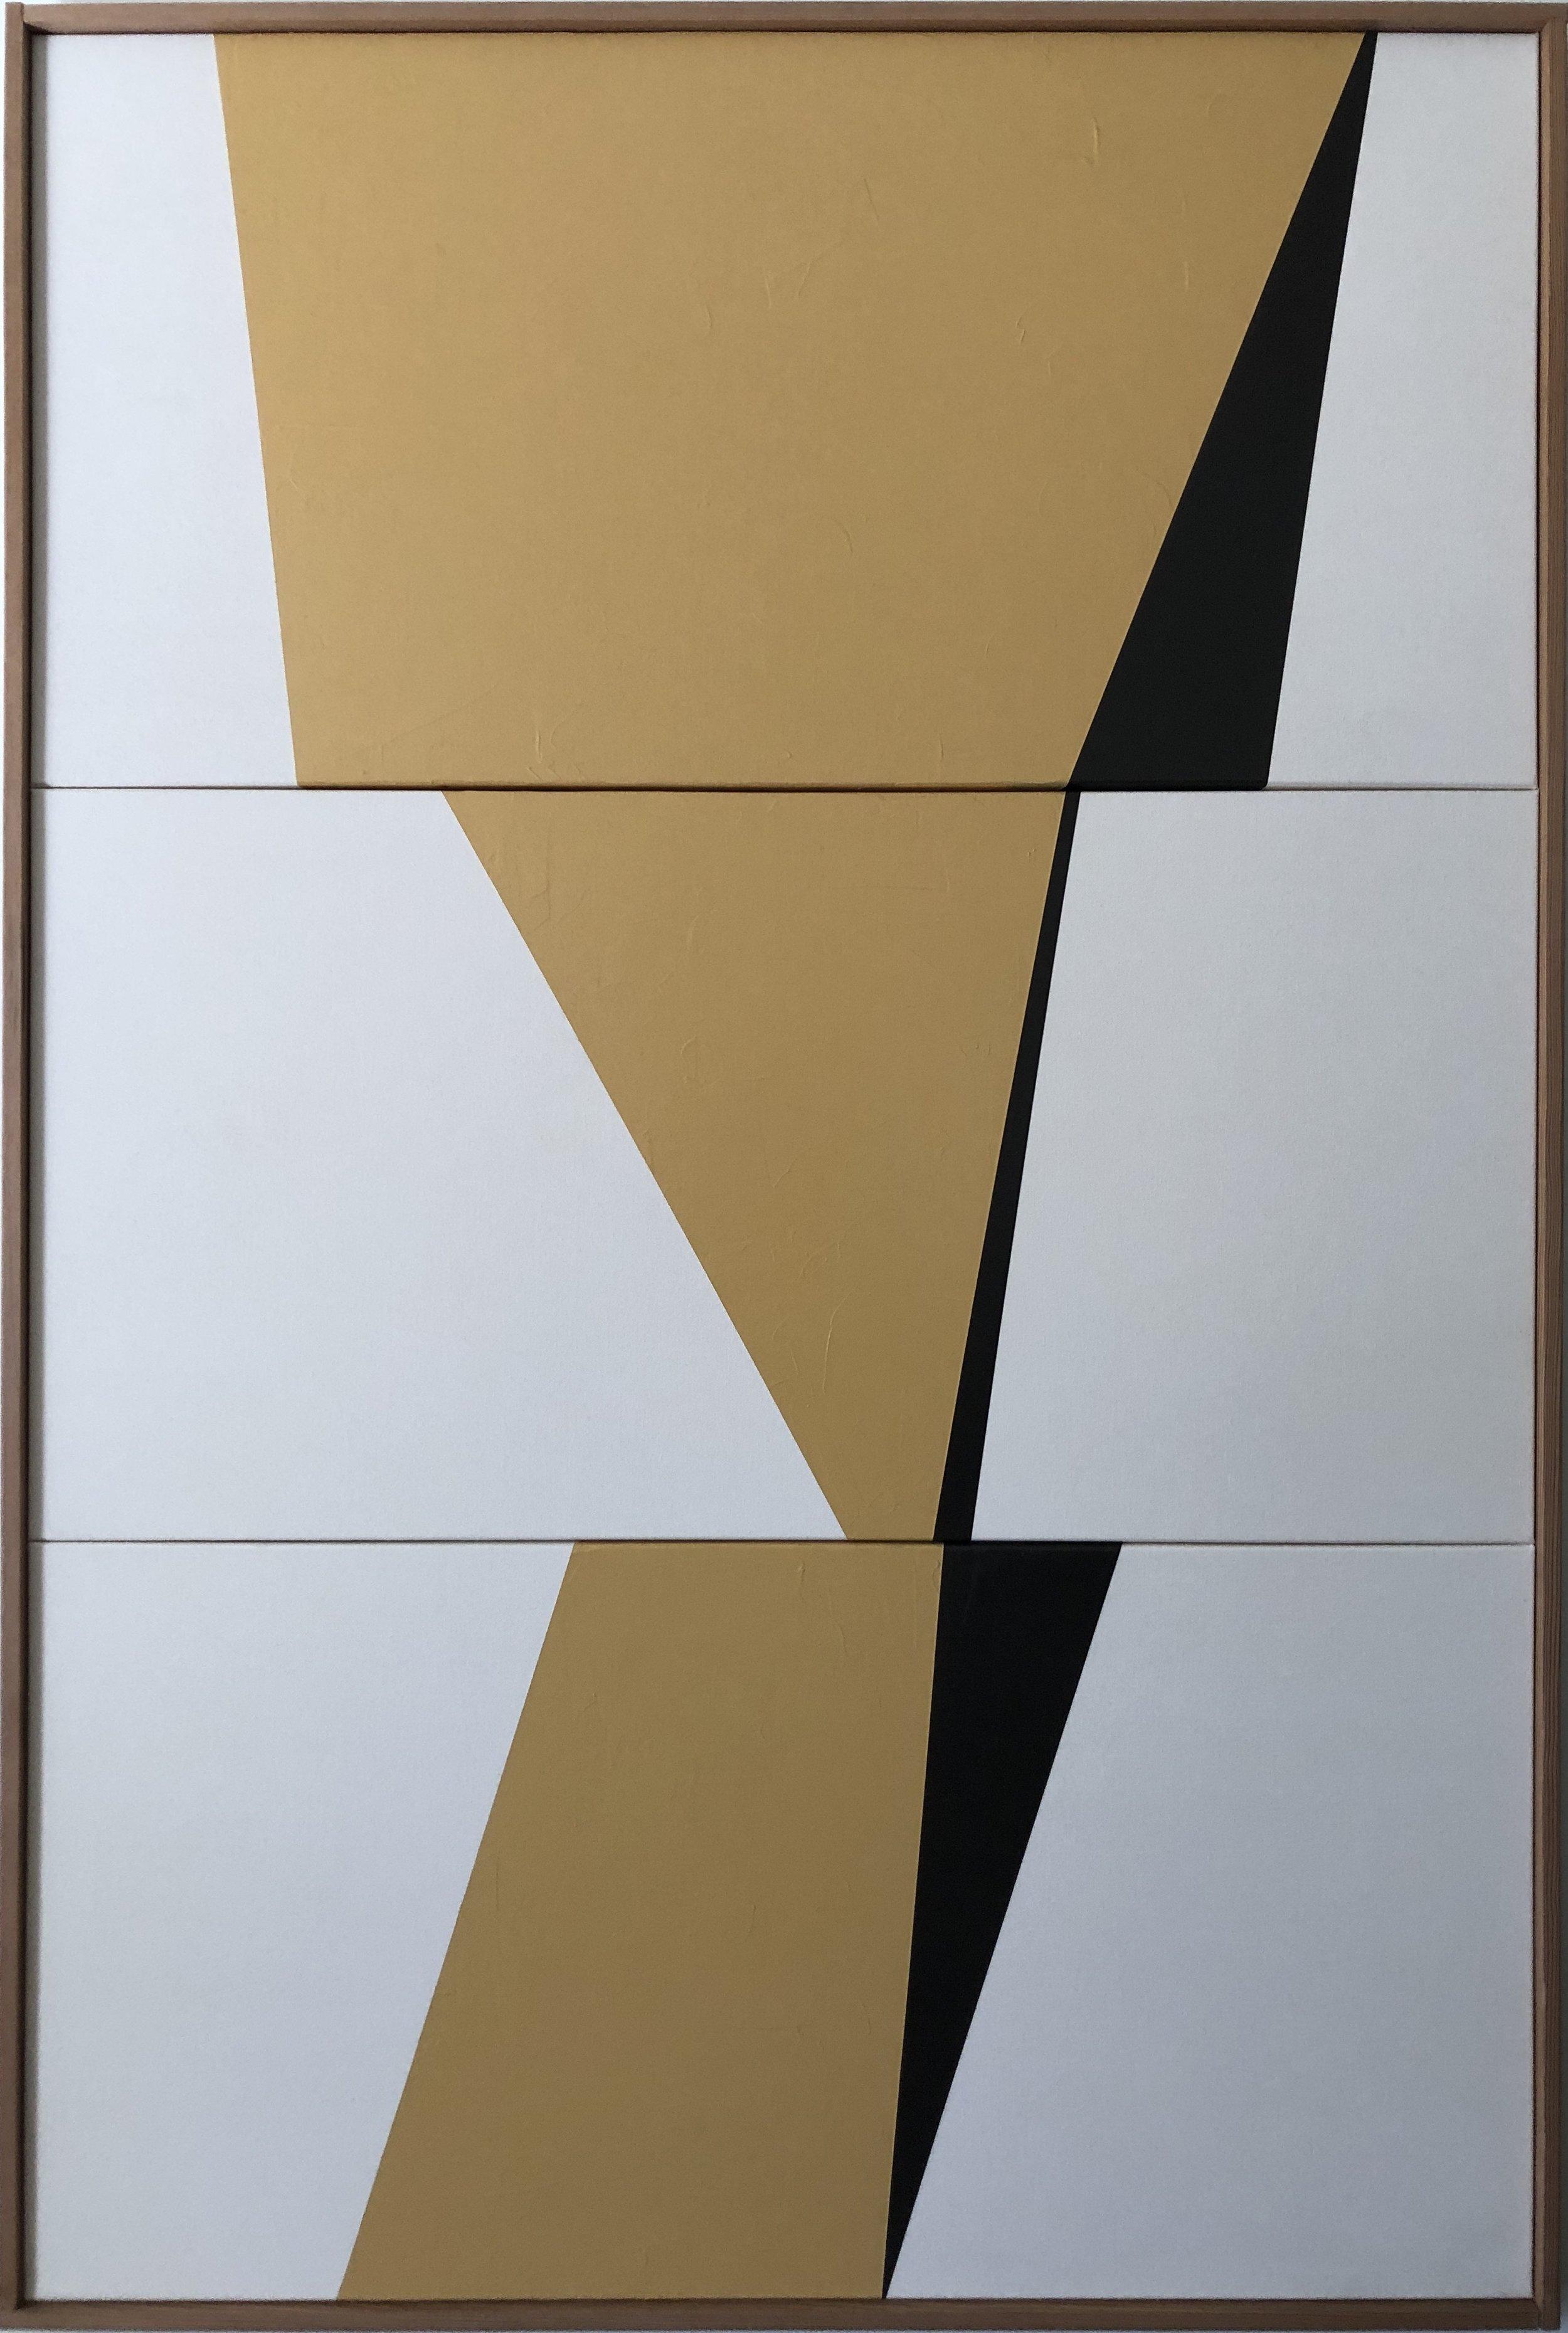 Beige Formation Triptych JET0591 - Image 1.JPG